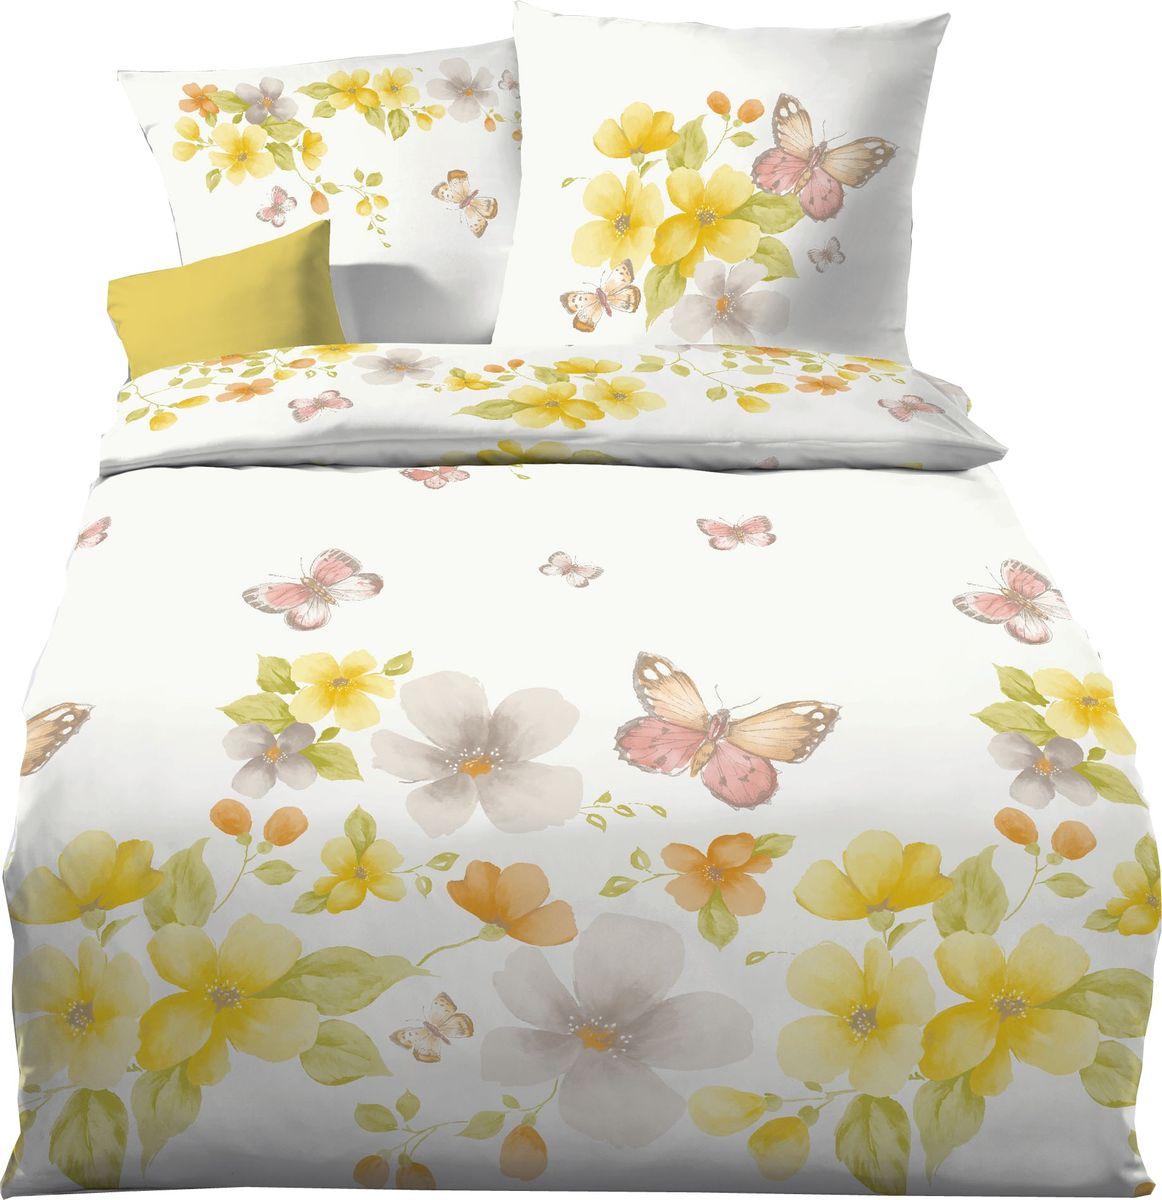 kaeppel linon renforc bettw sche 2 tlg colette honig. Black Bedroom Furniture Sets. Home Design Ideas